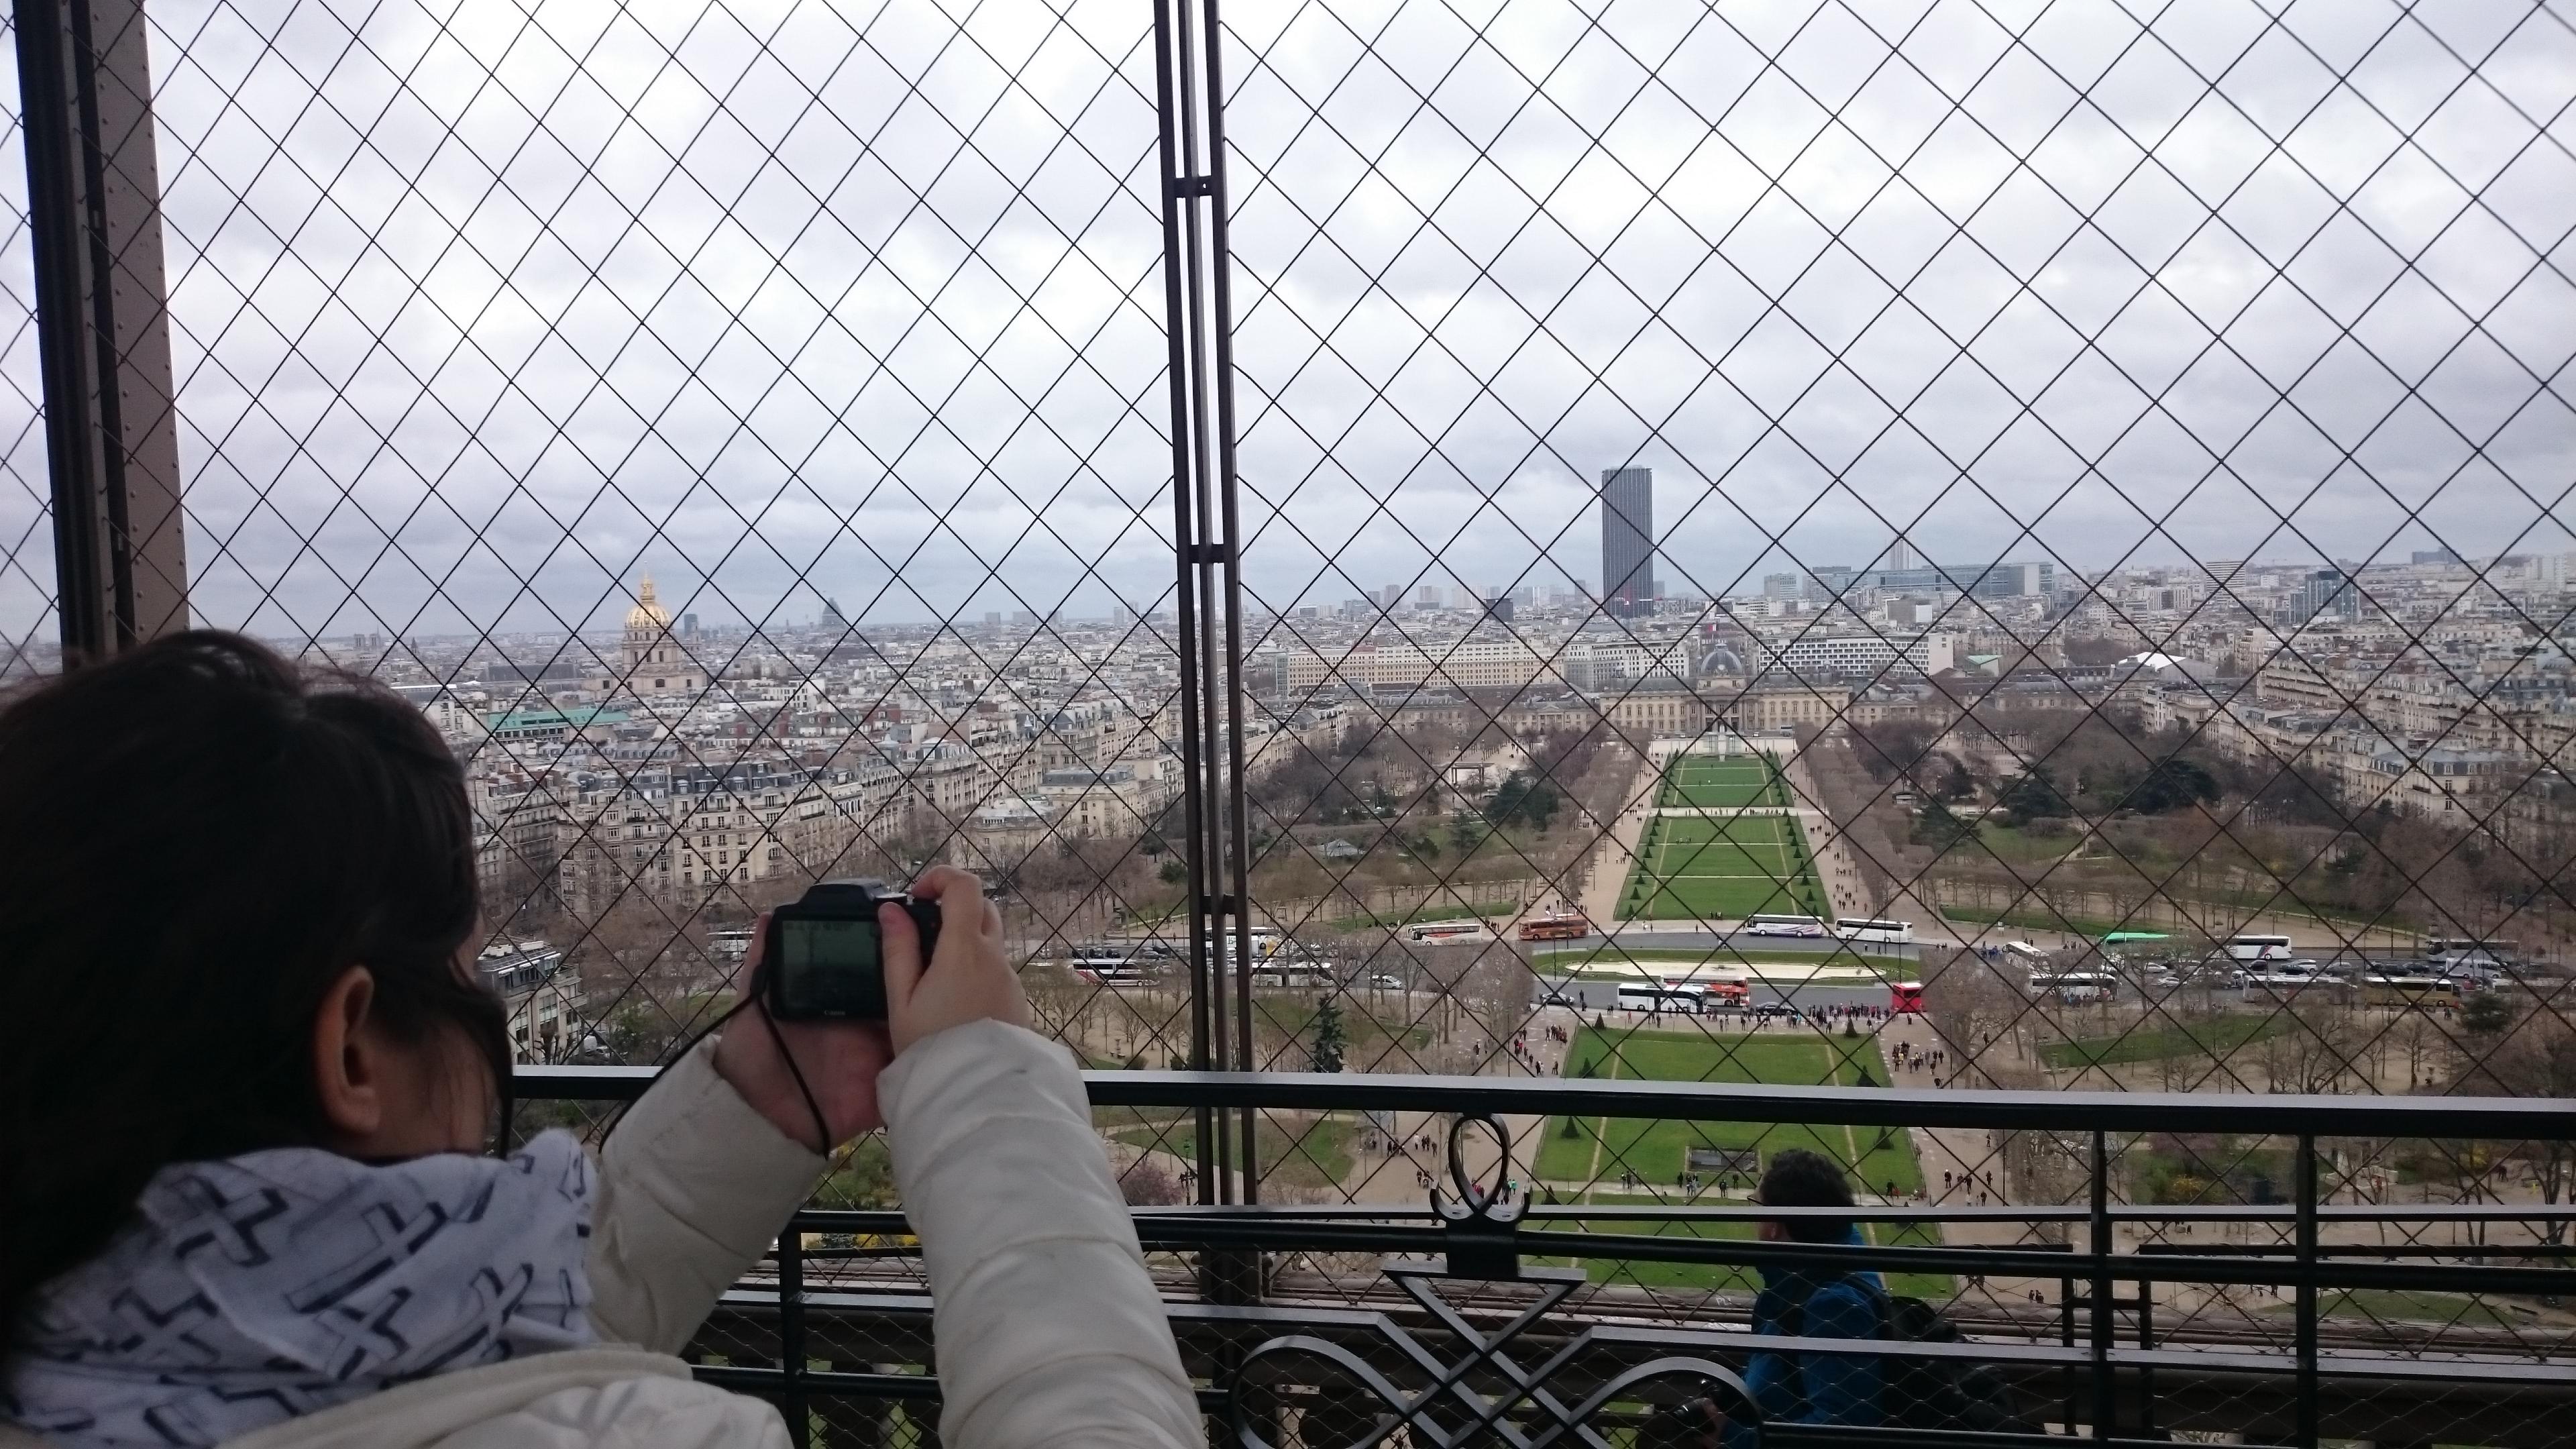 DSC 1967 - Visitando la Torre Eiffel en Paris